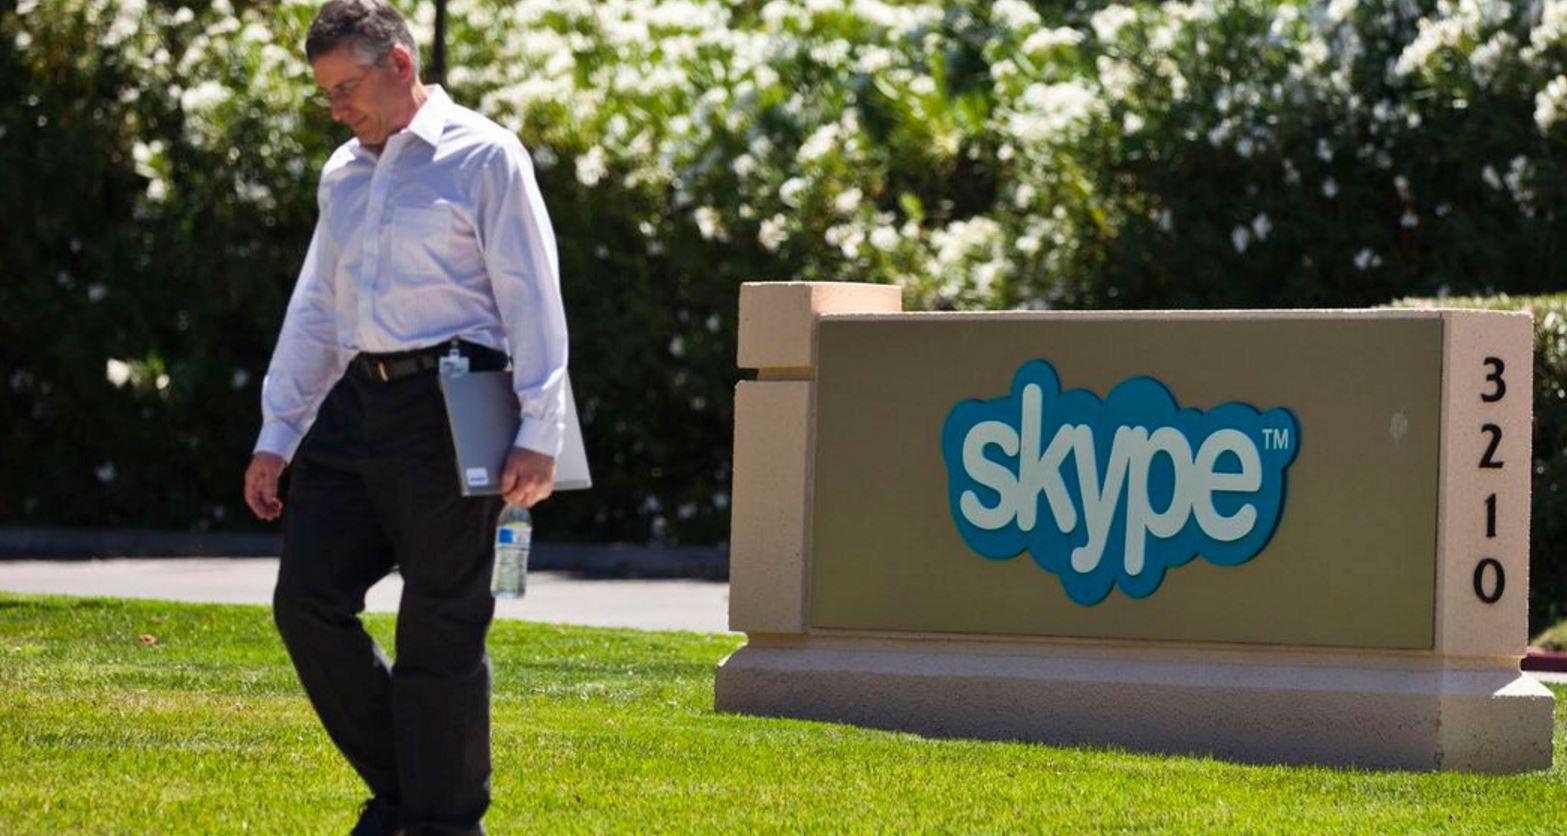 skype-cierre-londres